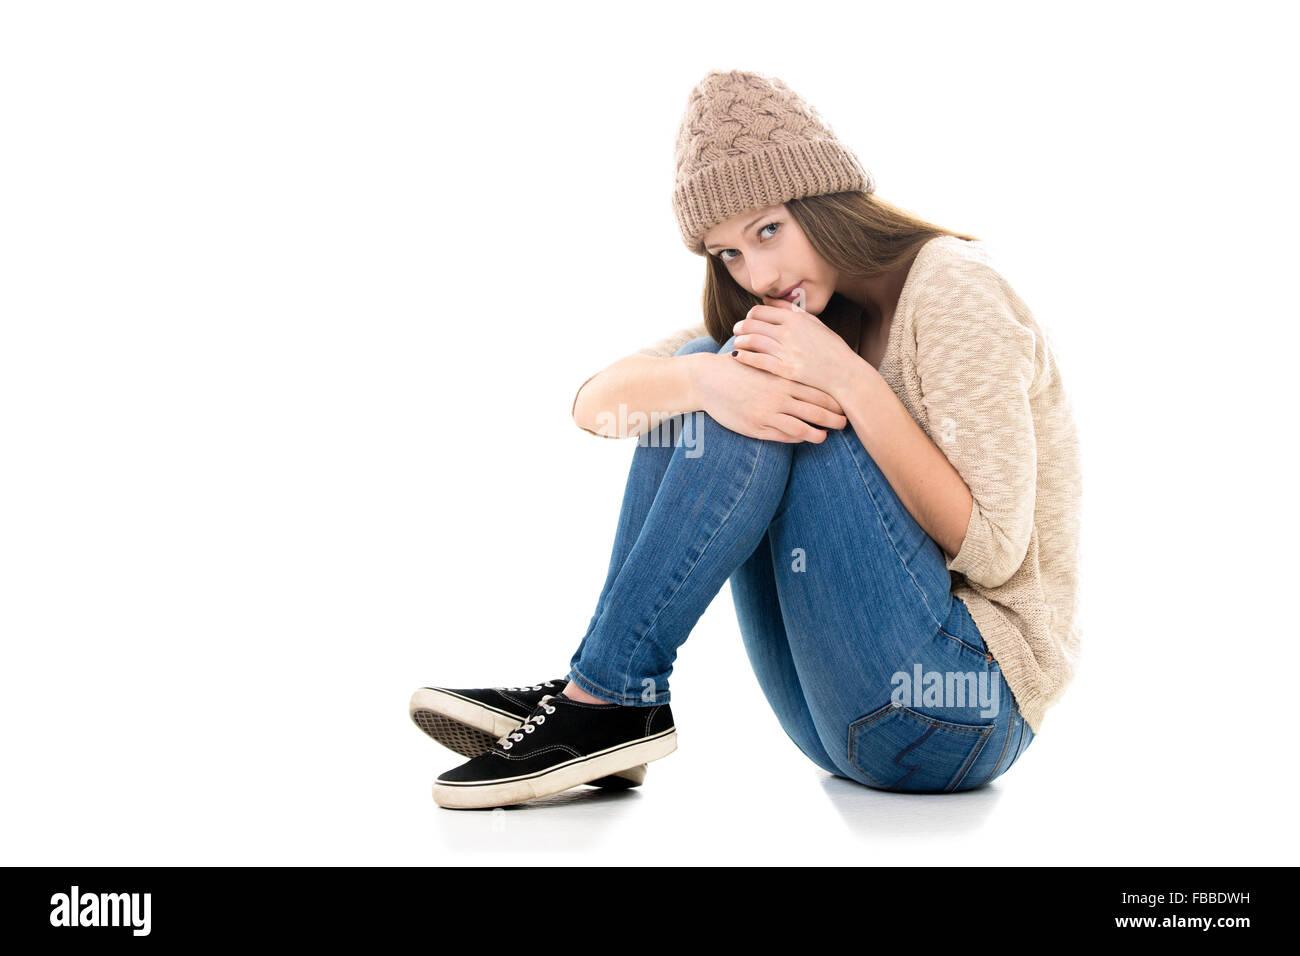 Rubbed horny teen girl